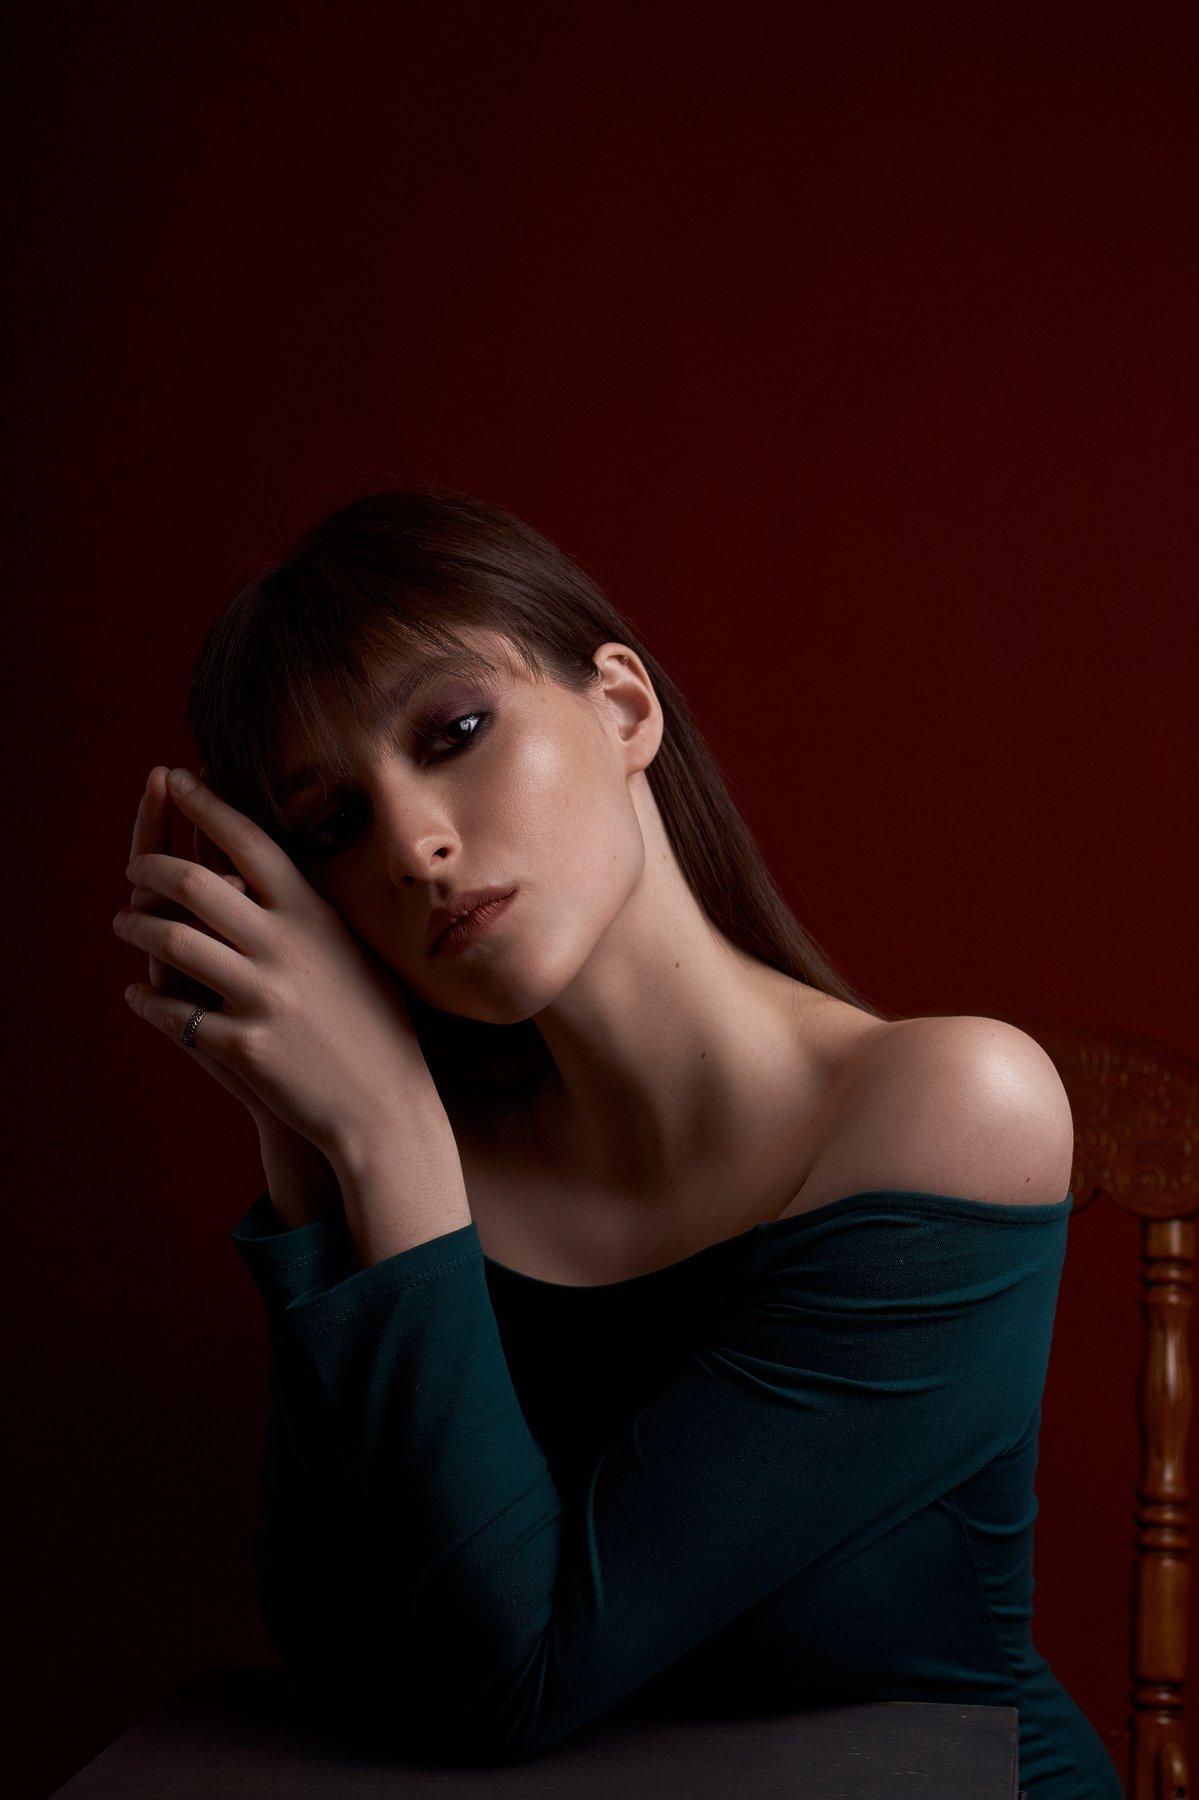 portrait, портрет, girl, eyes, low key, Наташа Высоцкая